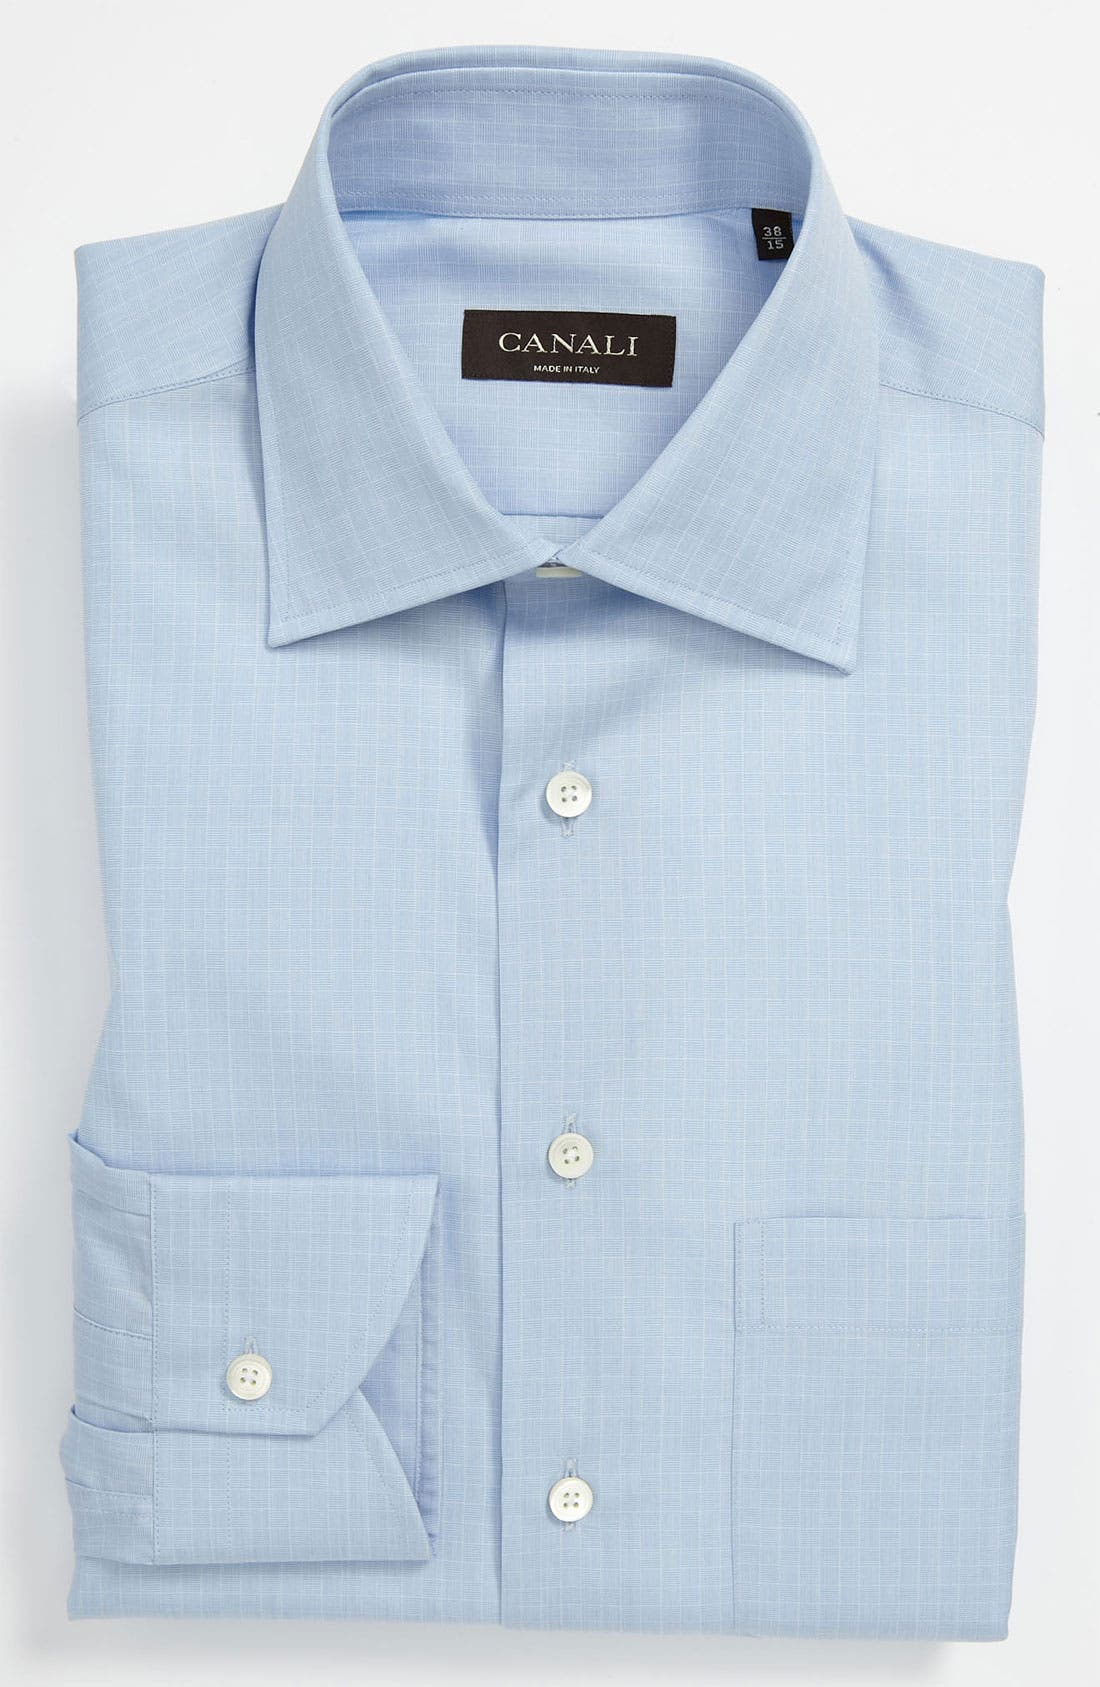 Alternate Image 1 Selected - Canali Modern Fit Dress Shirt